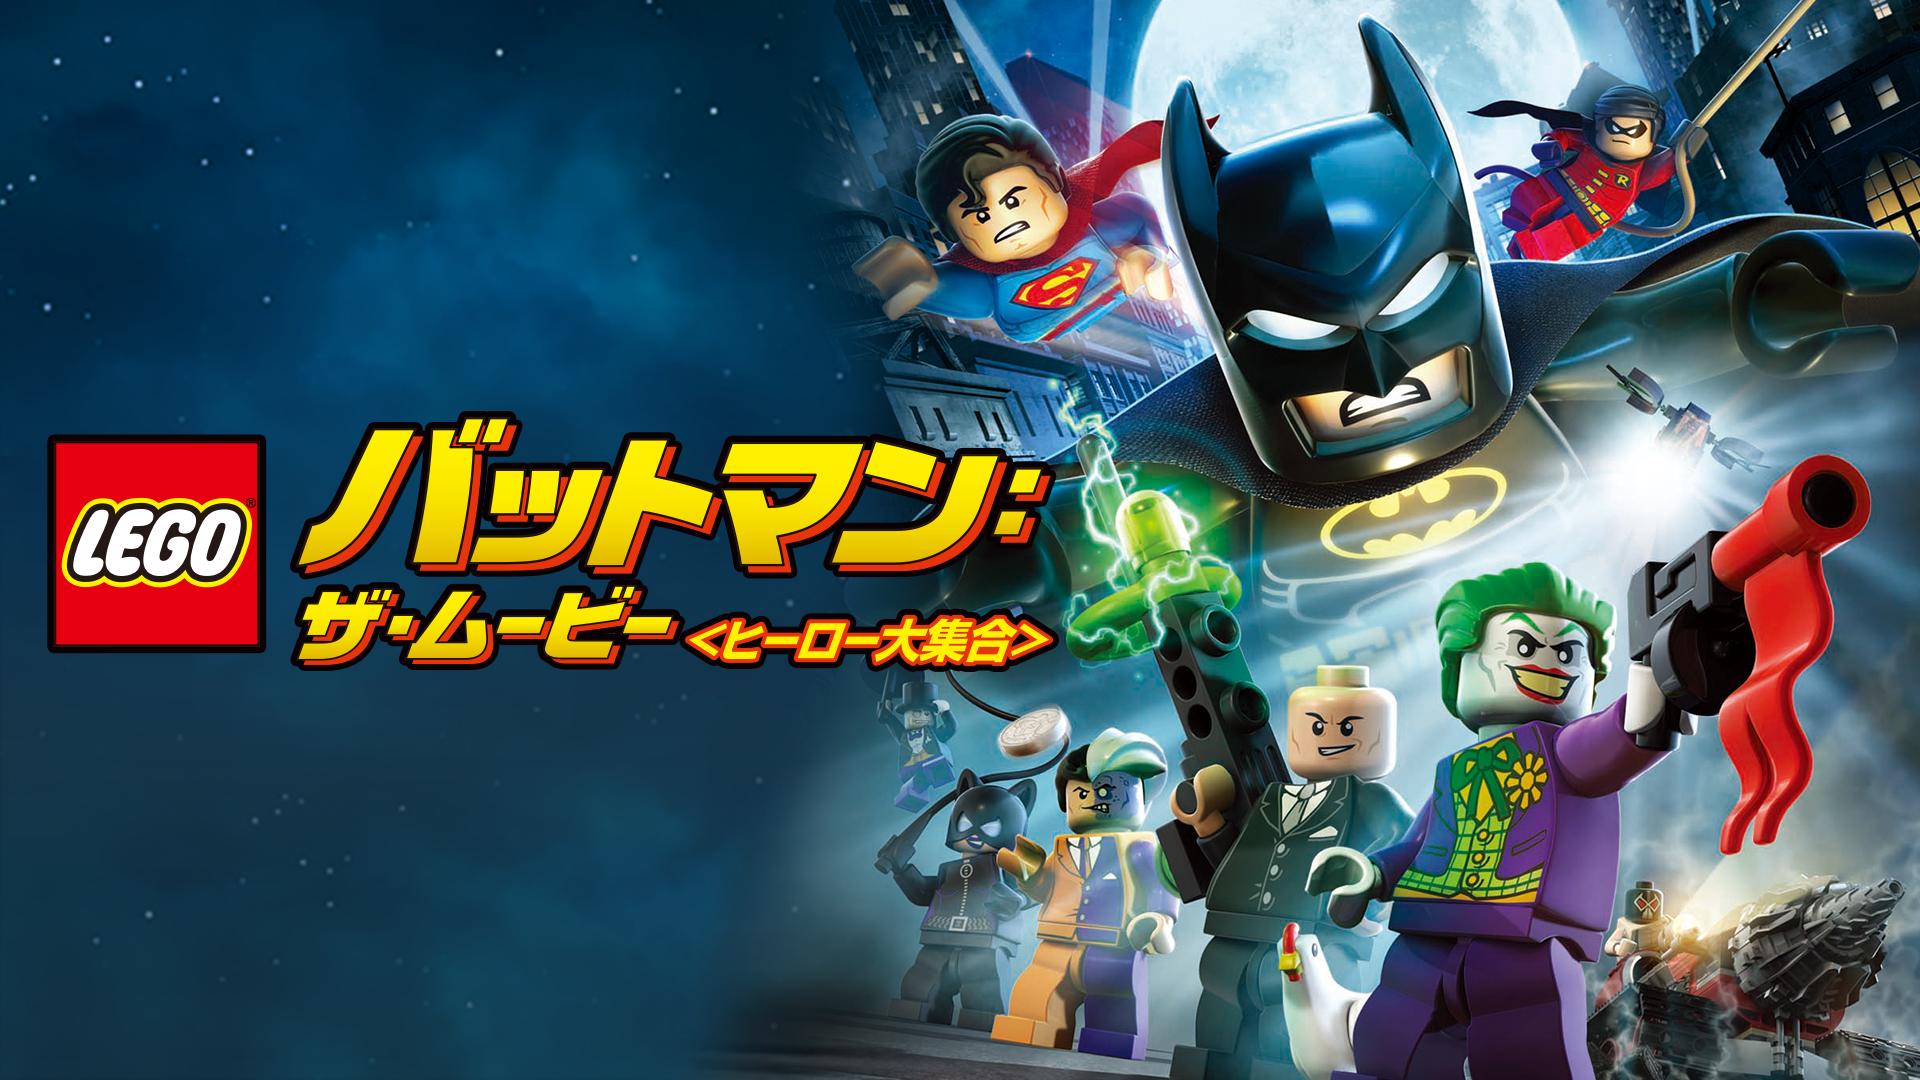 LEGO(R) バットマン: ザ・ムービー<ヒーロー大集合></a><h4 class=